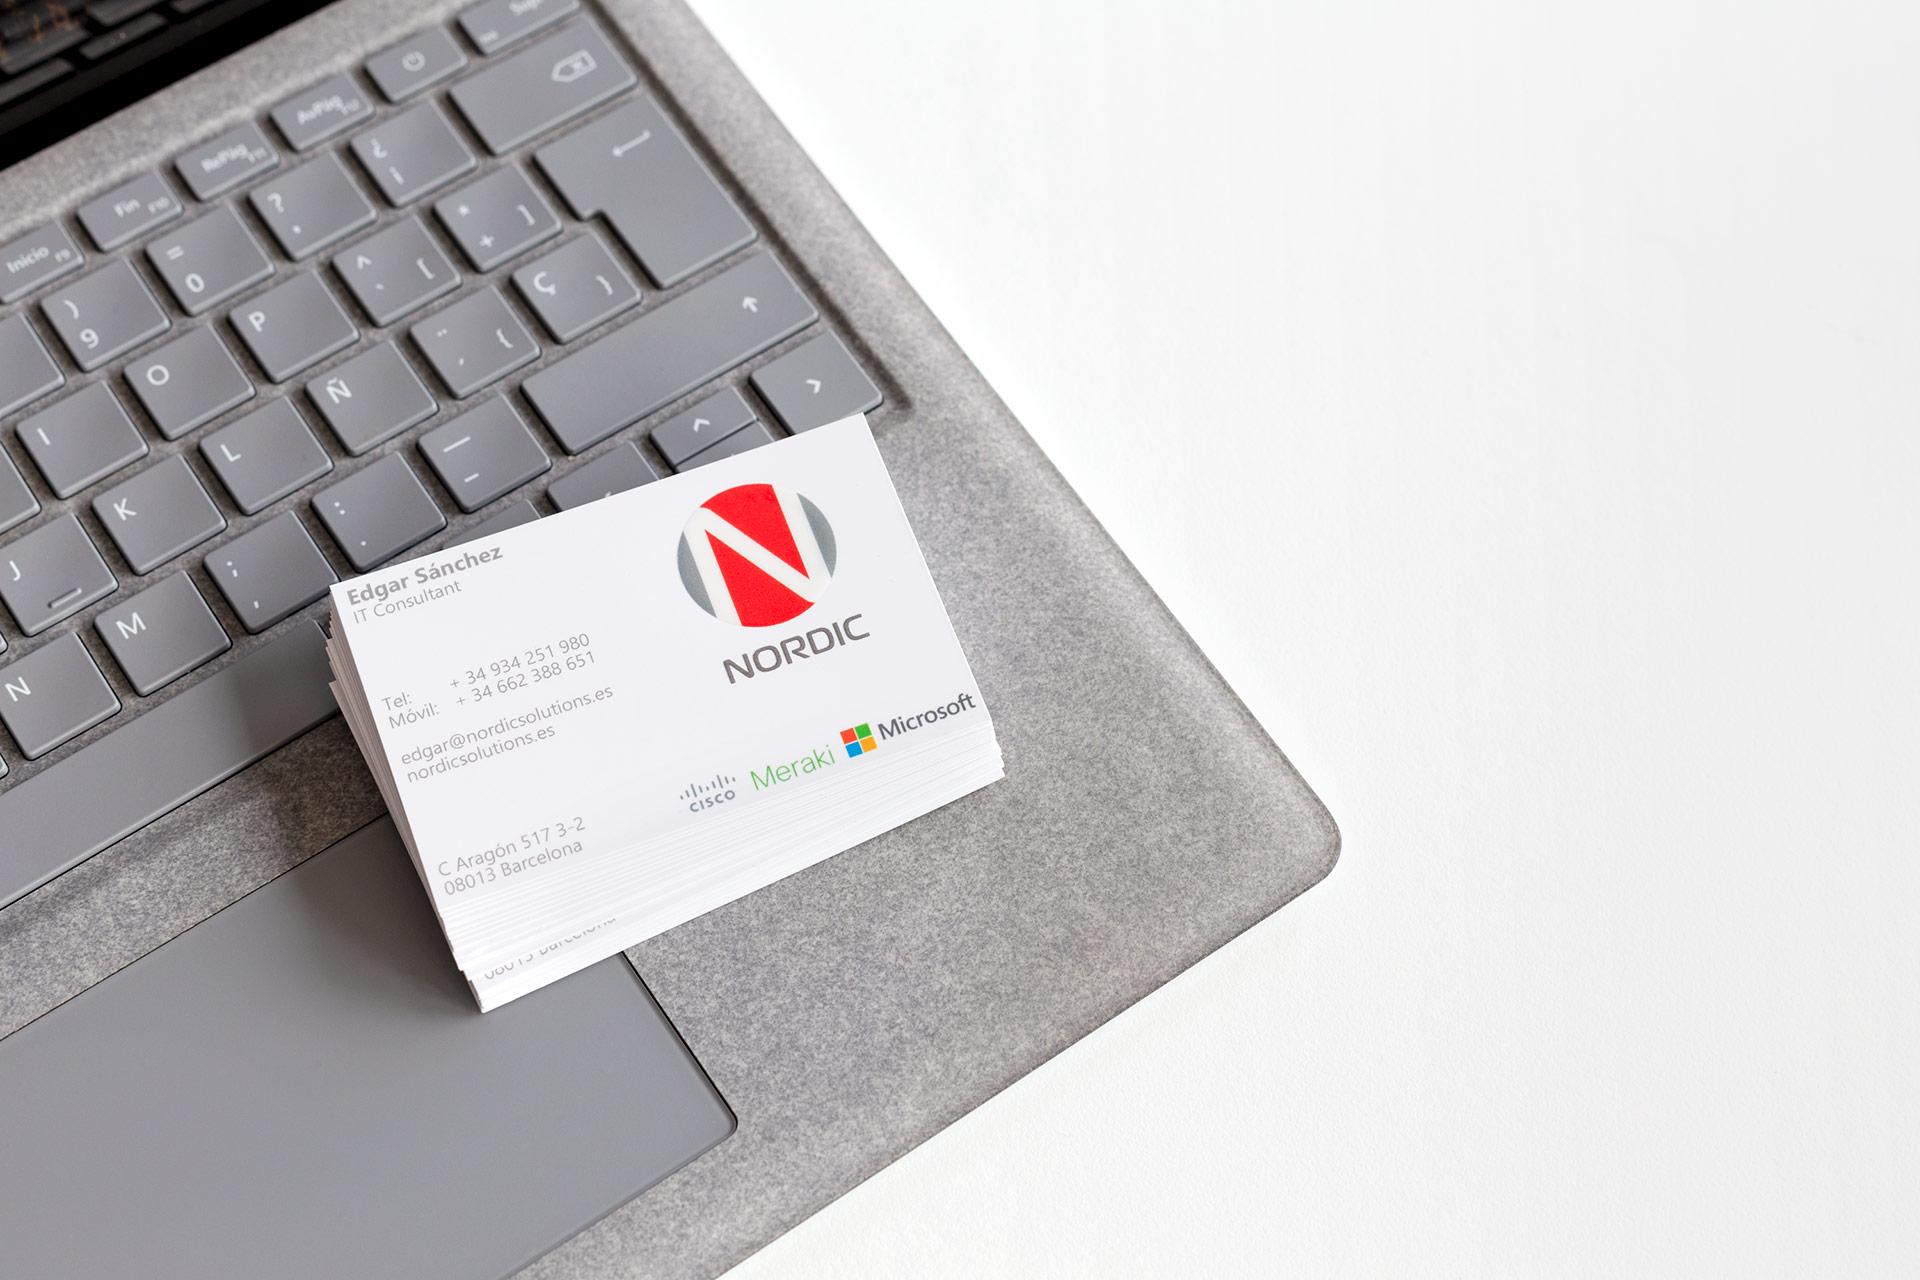 nordic-solutions-7101.jpg